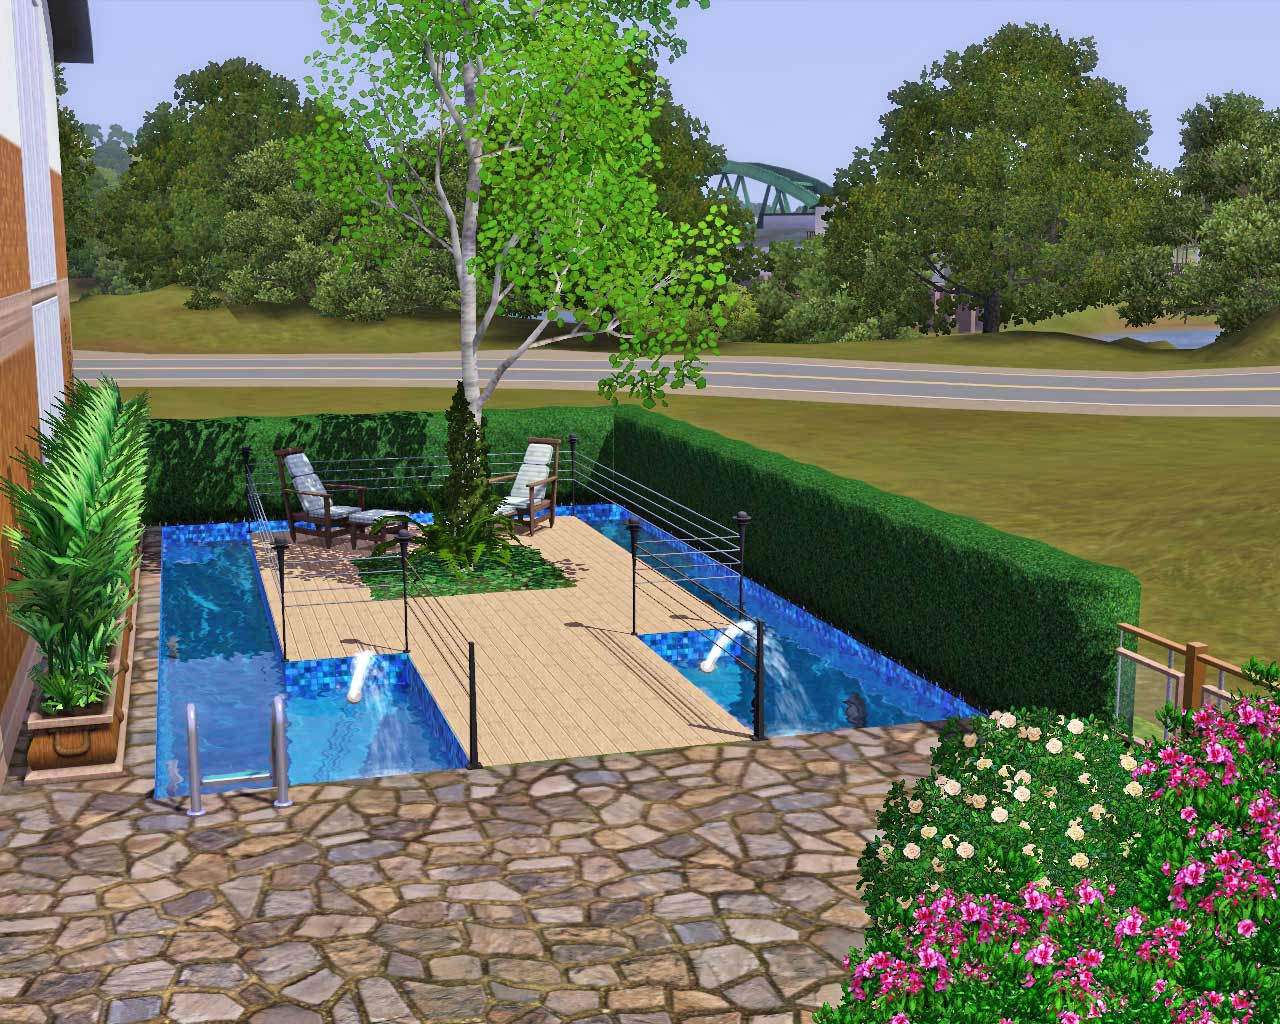 Mod The Sims Ledomus Starter Home Plan 3 No Cc The Home Plans